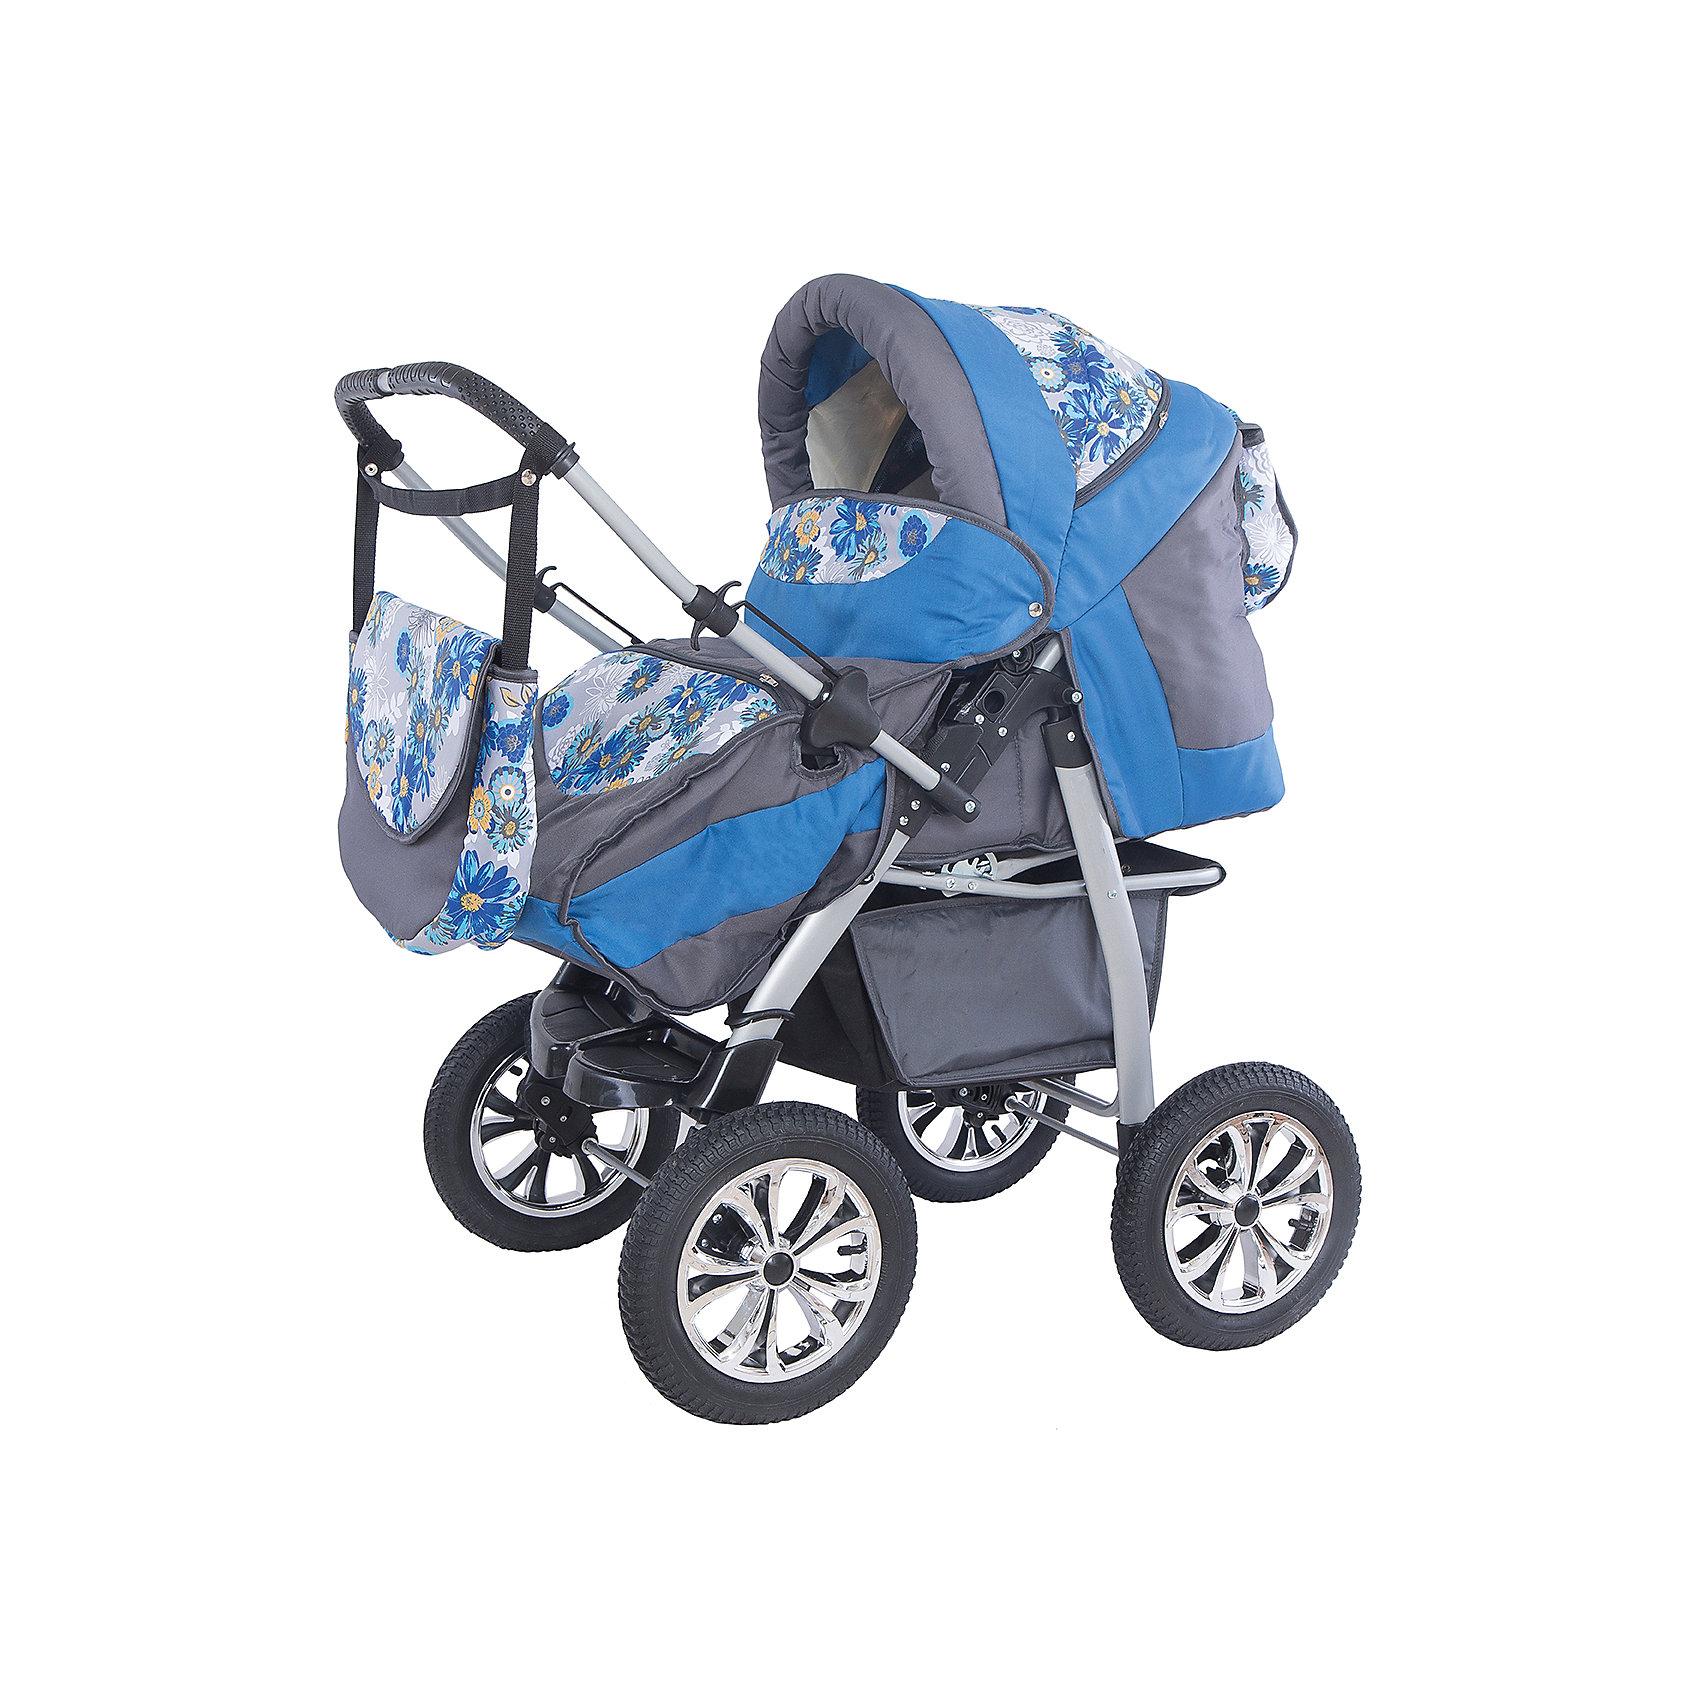 Smile Line Коляска-трансформер OSCAR PCOs 03, Smile Line, серый/голубой-принт коляска 2 в 1 smile line indiana 17 classic 12